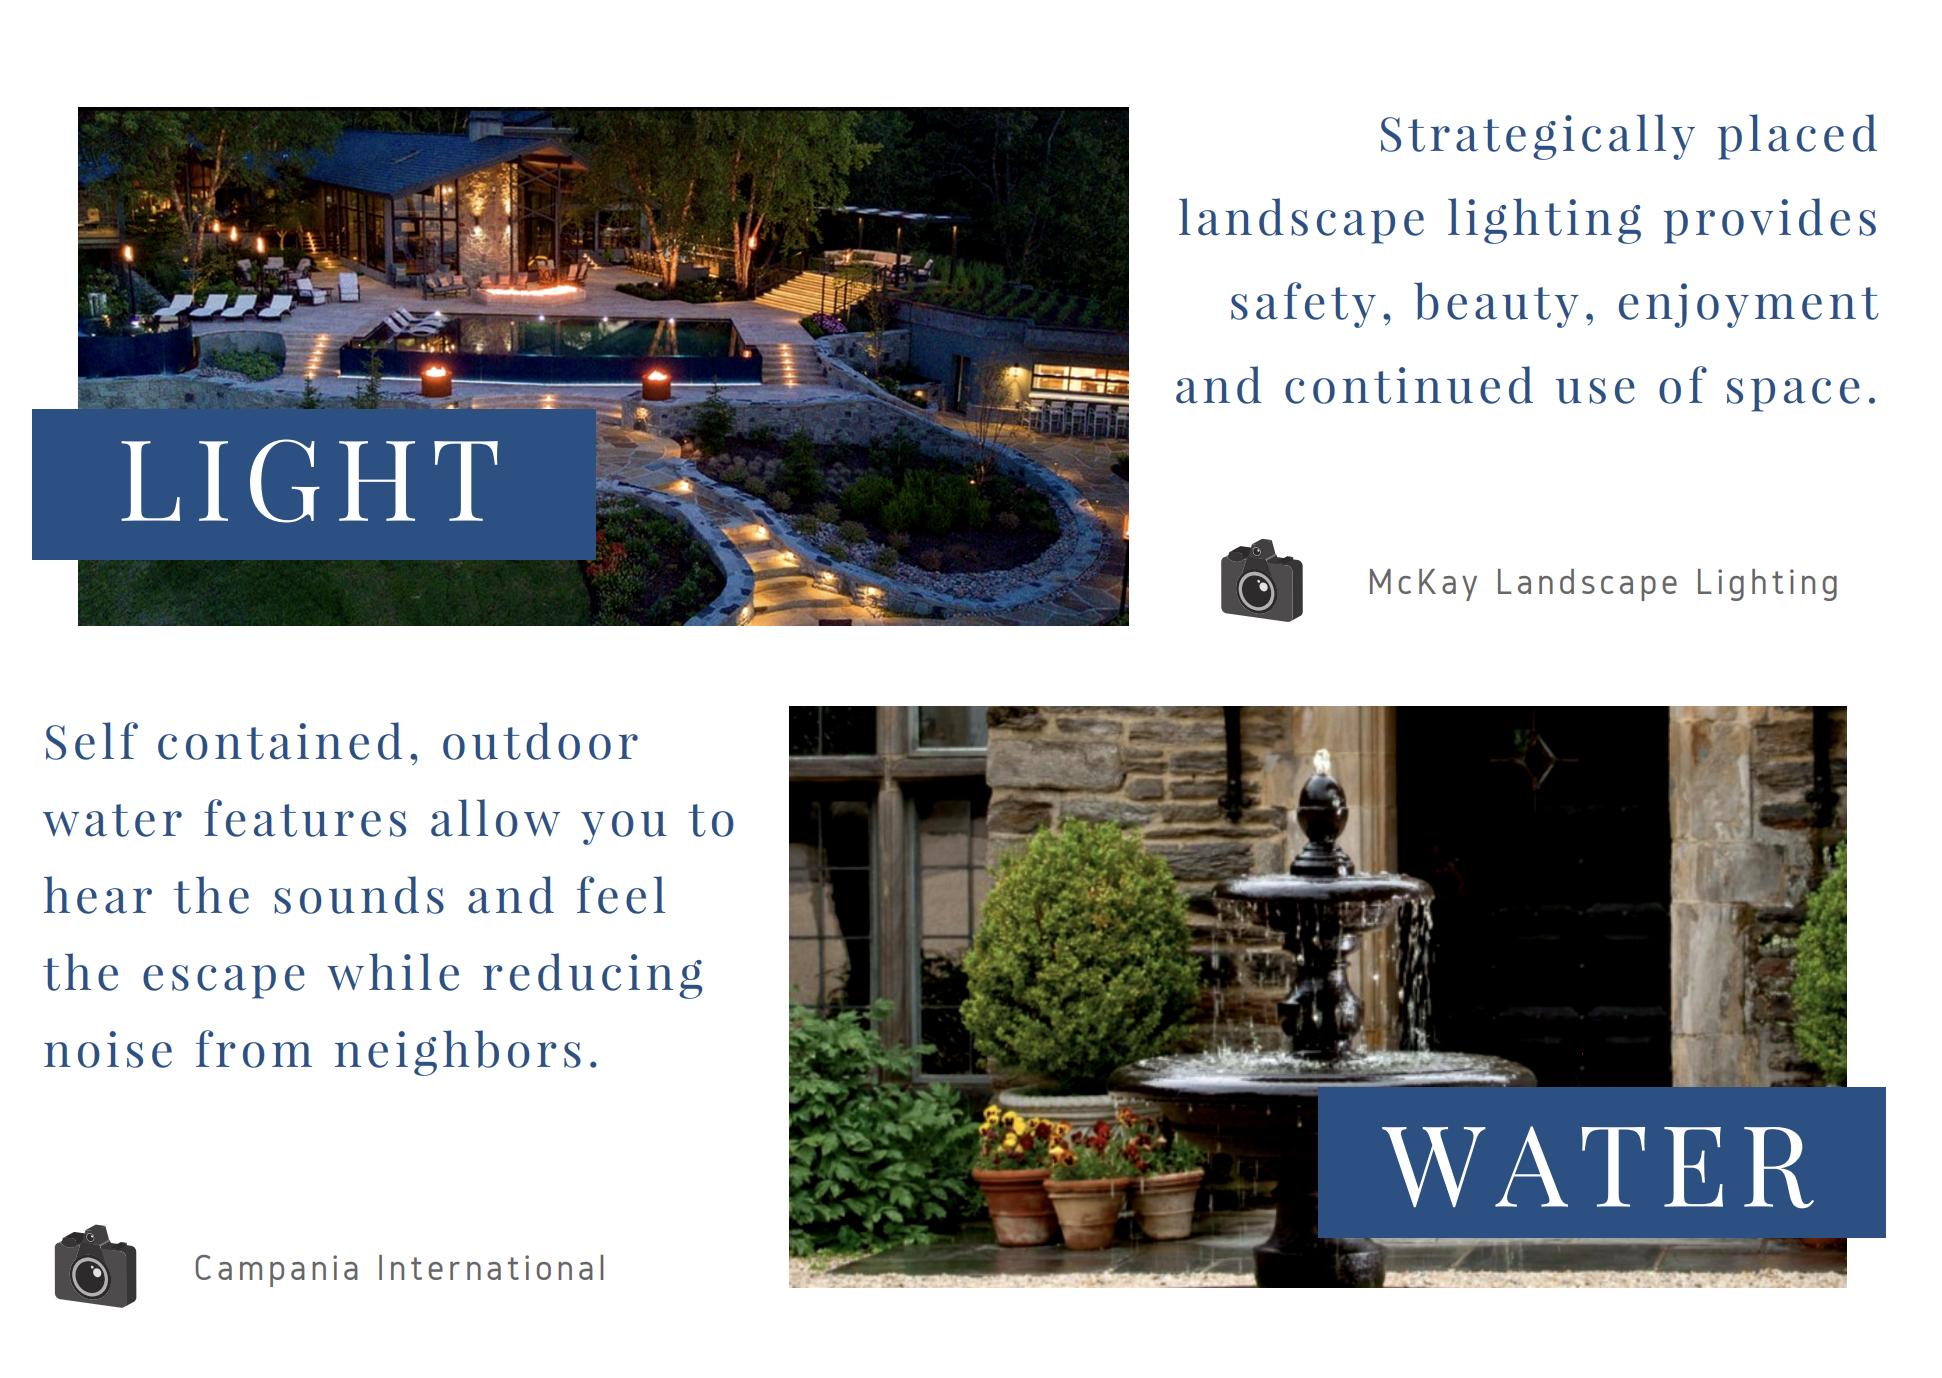 Weaver_Garden_Morano_Landscape_Lights_Water_Tips_Tricks_Ideas_Fox_Friends.png